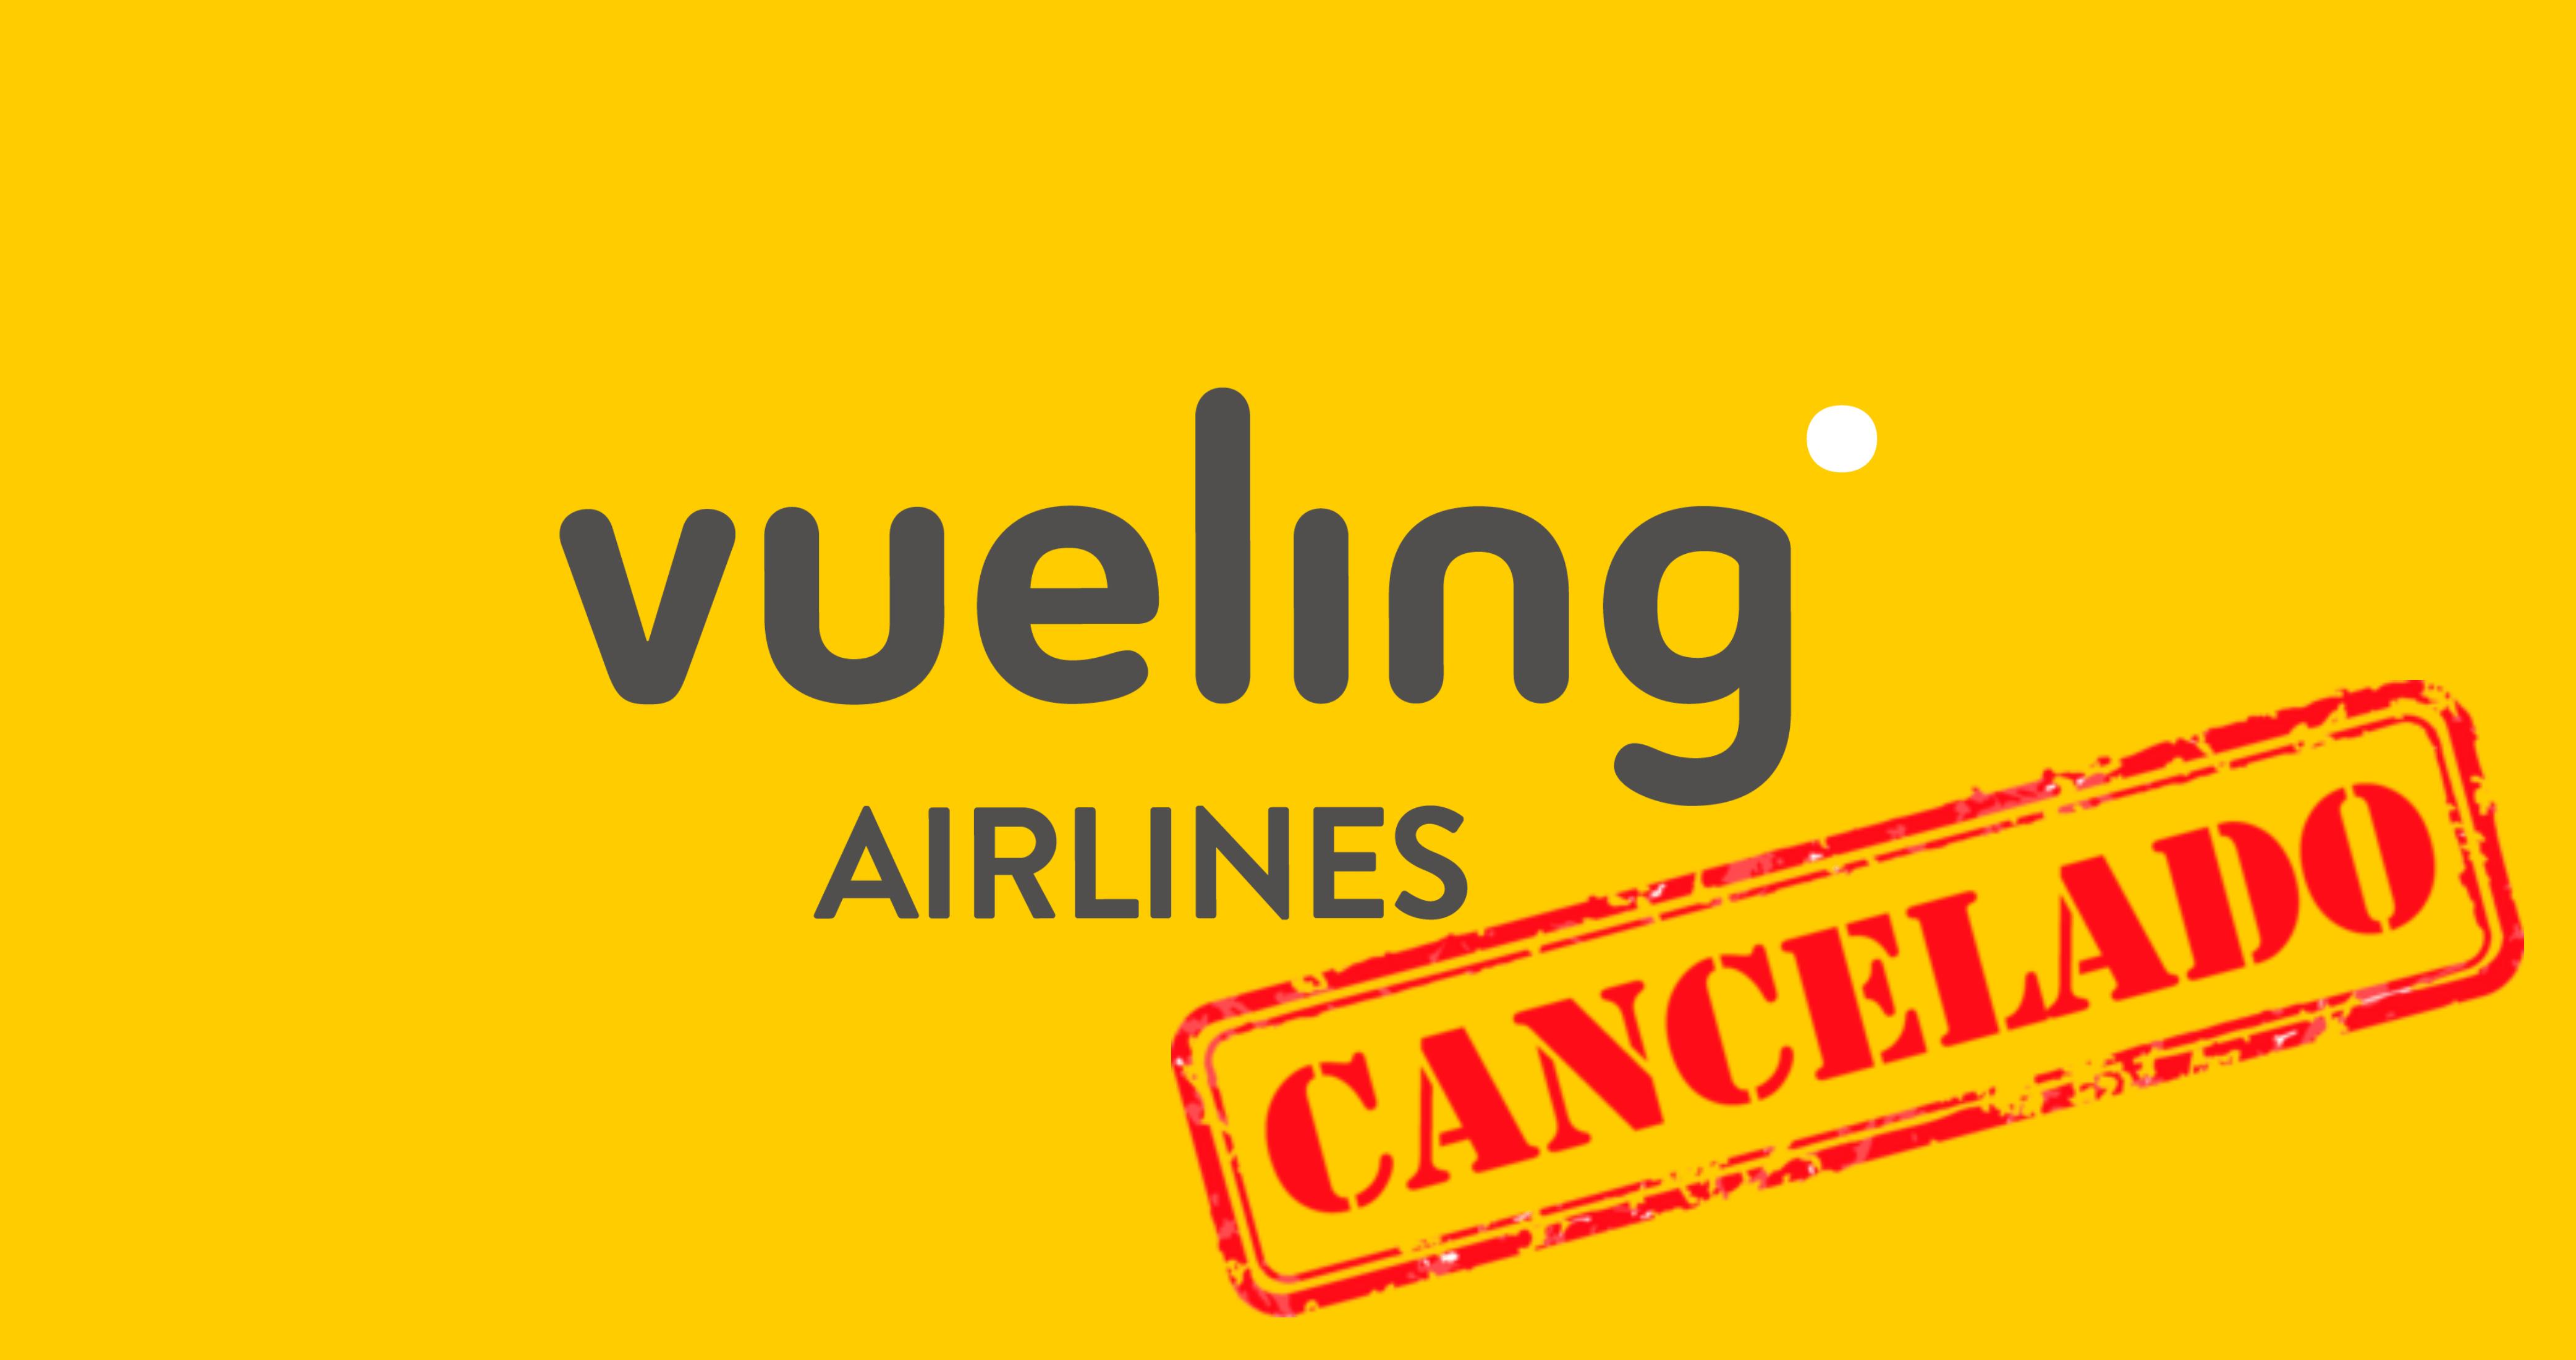 cancelar vuelo vueling